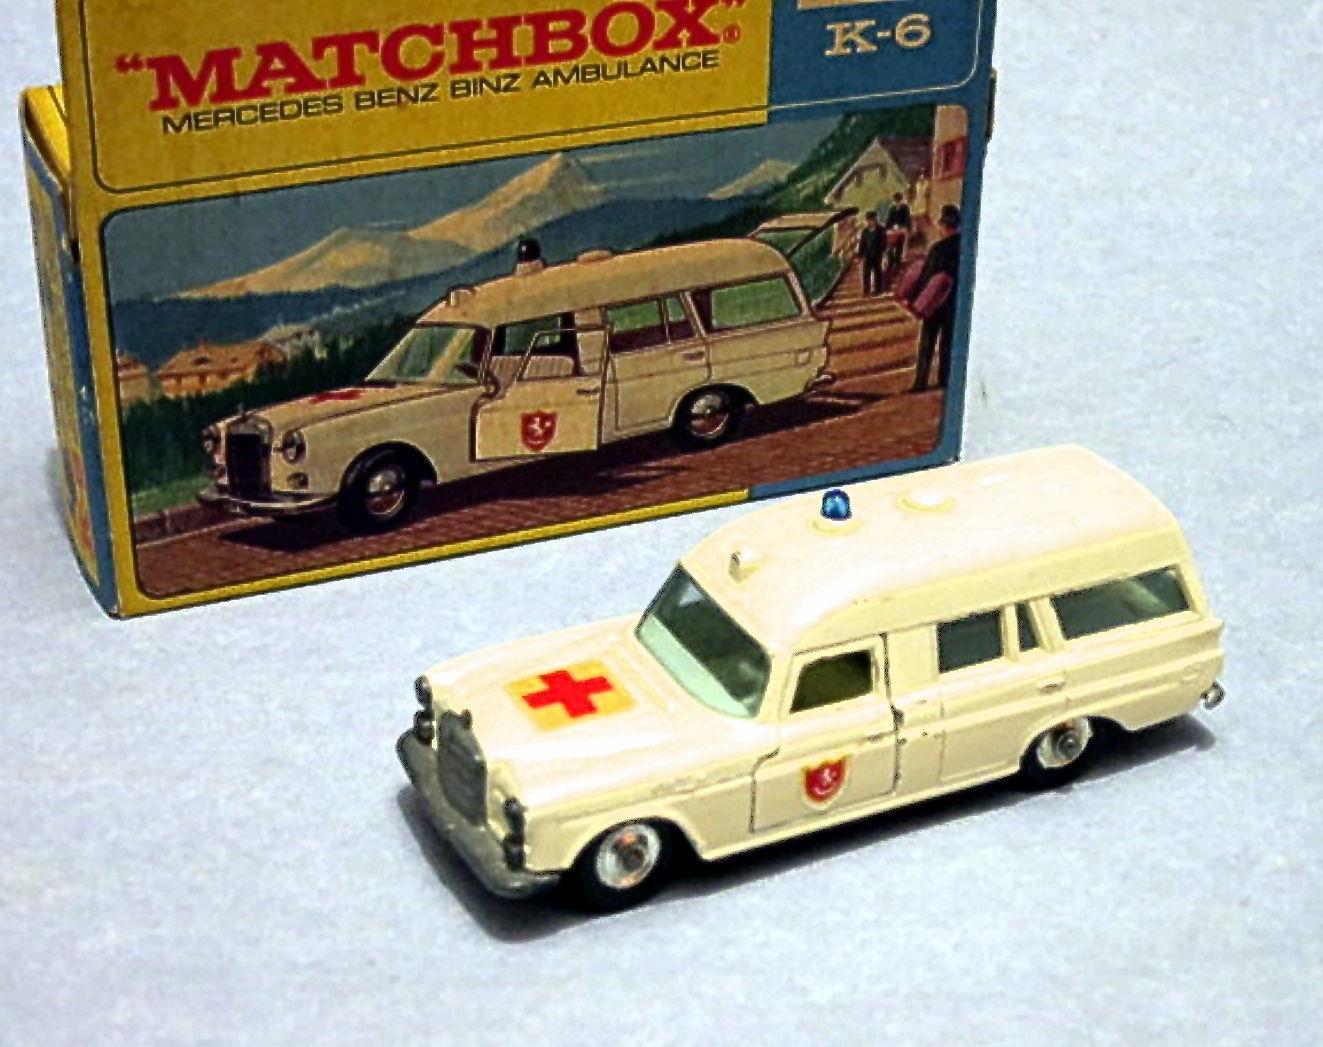 Mercedes Benz Ambulance (K6 K-26 K-63) | Matchbox Cars Wiki